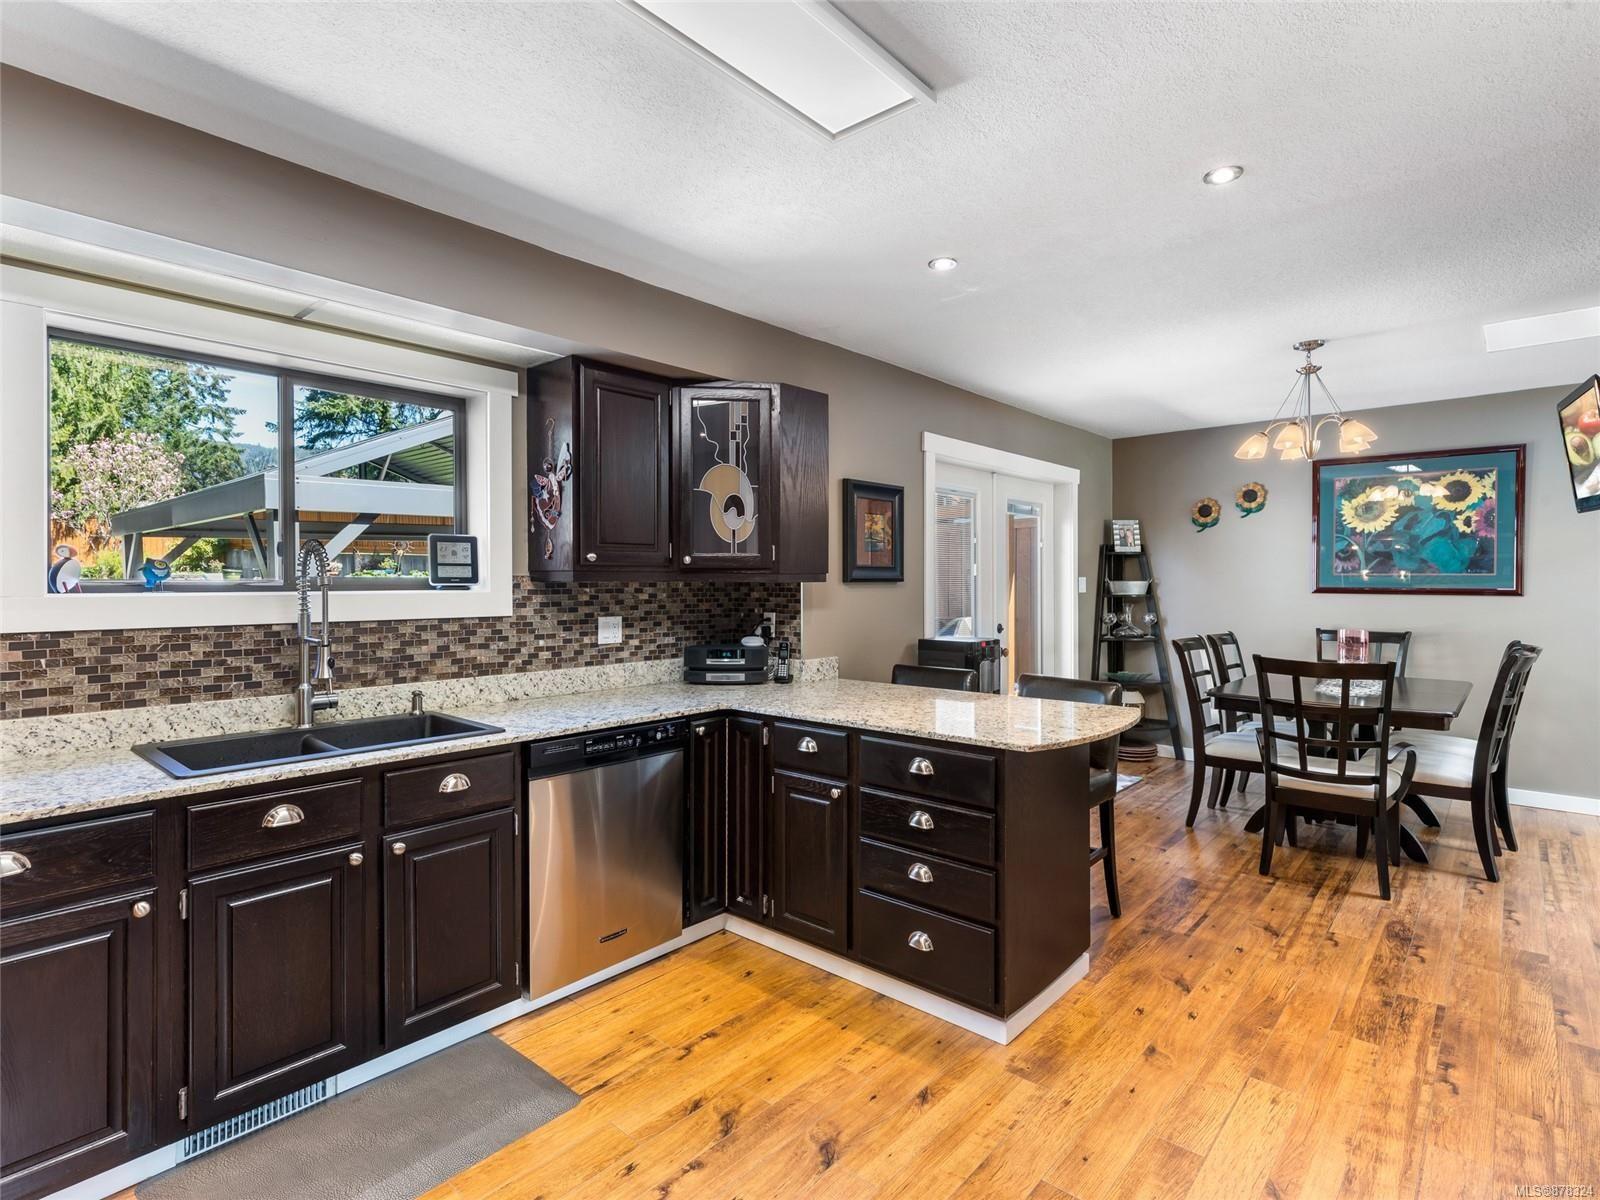 Photo 20: Photos: 3875 Moore Rd in : PA Port Alberni House for sale (Port Alberni)  : MLS®# 878324